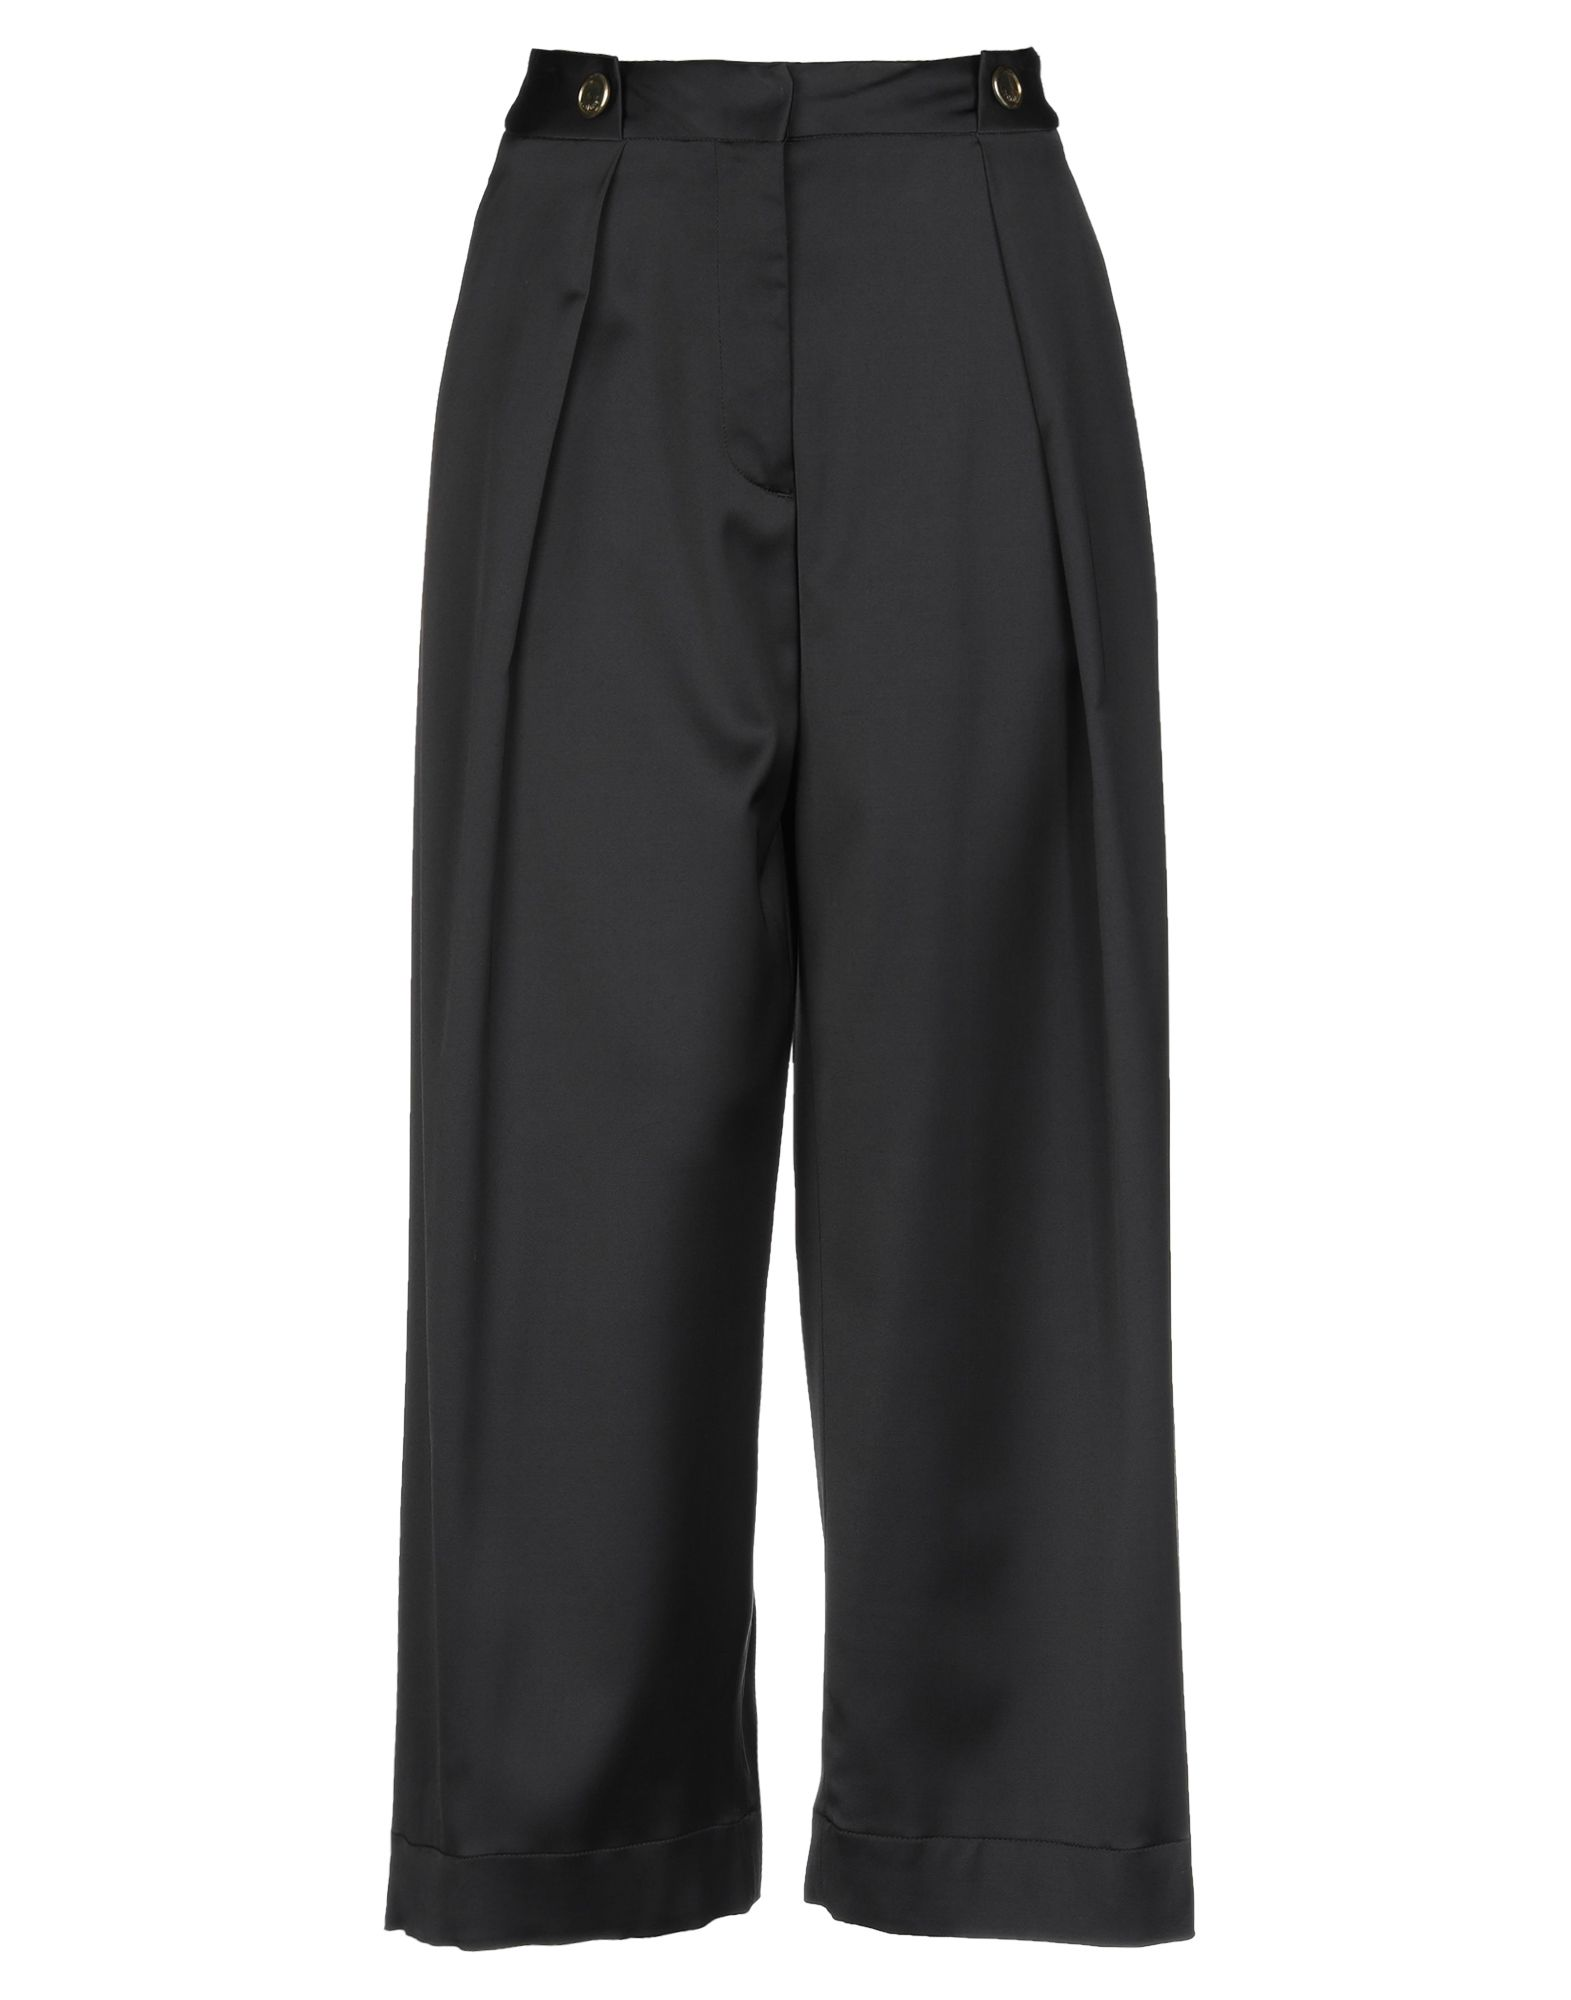 Pantalone Just Cavalli donna donna donna - 13357649JL b1c